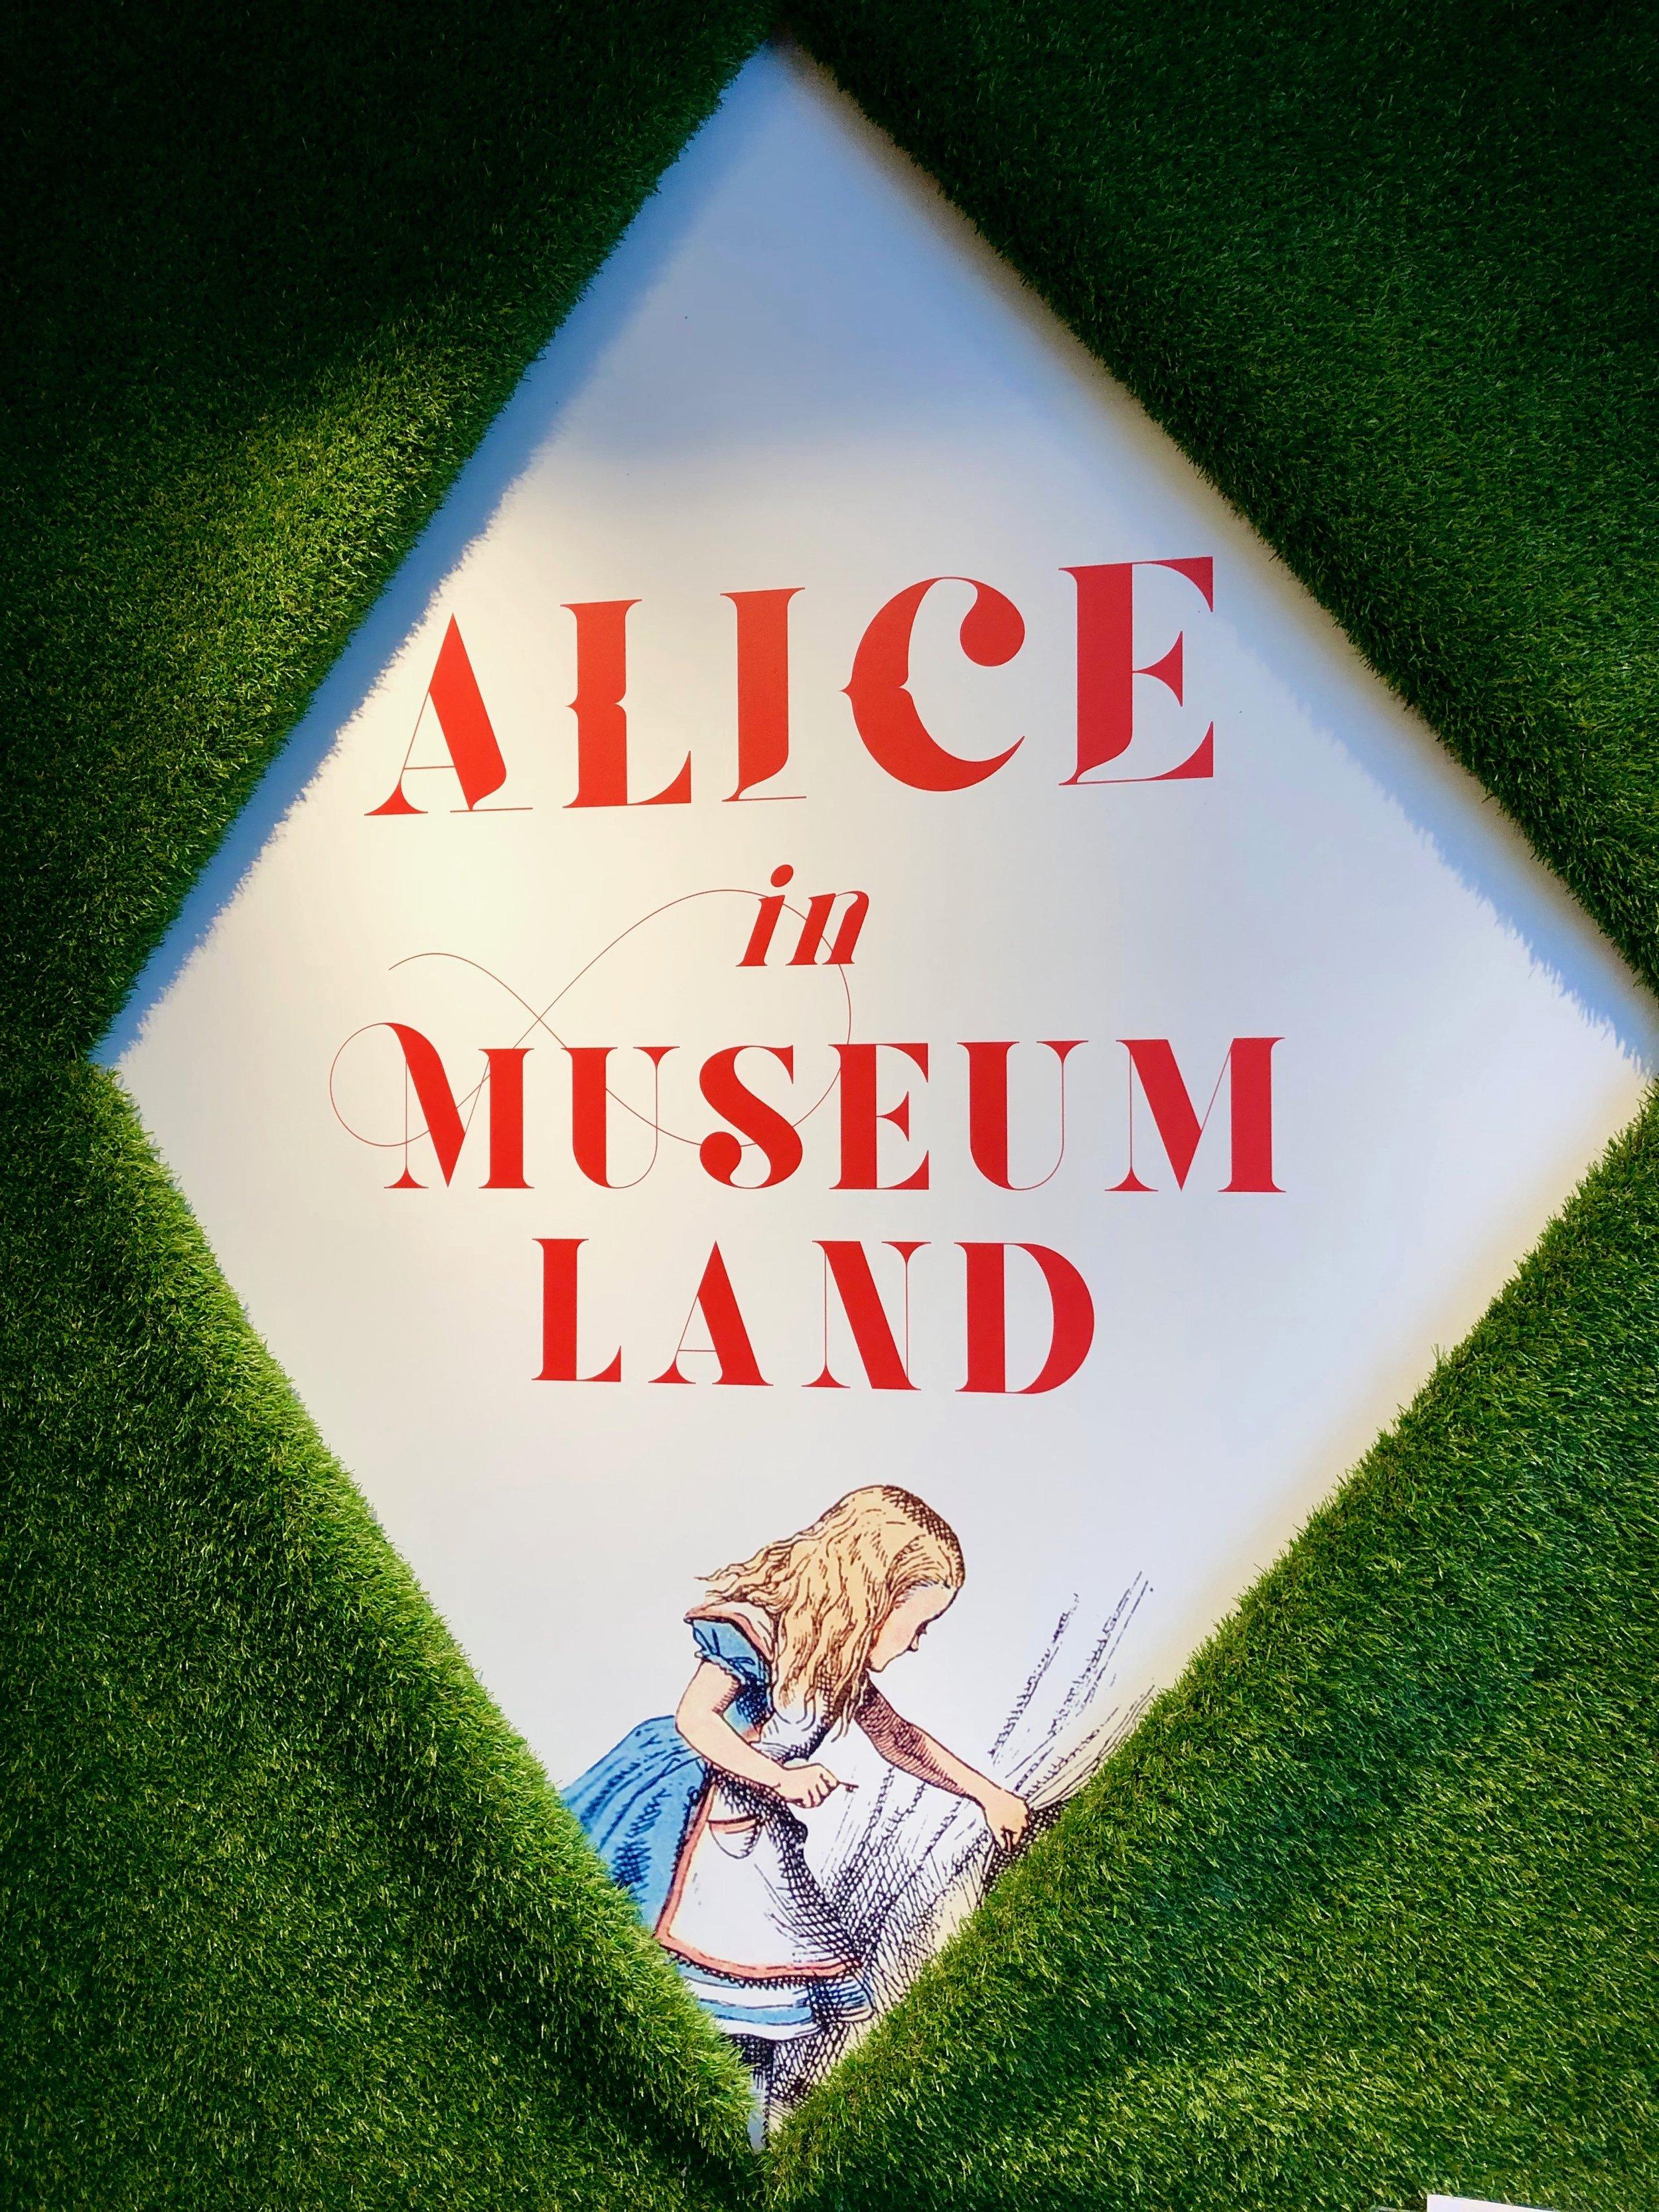 Alice in Museumland exhibit